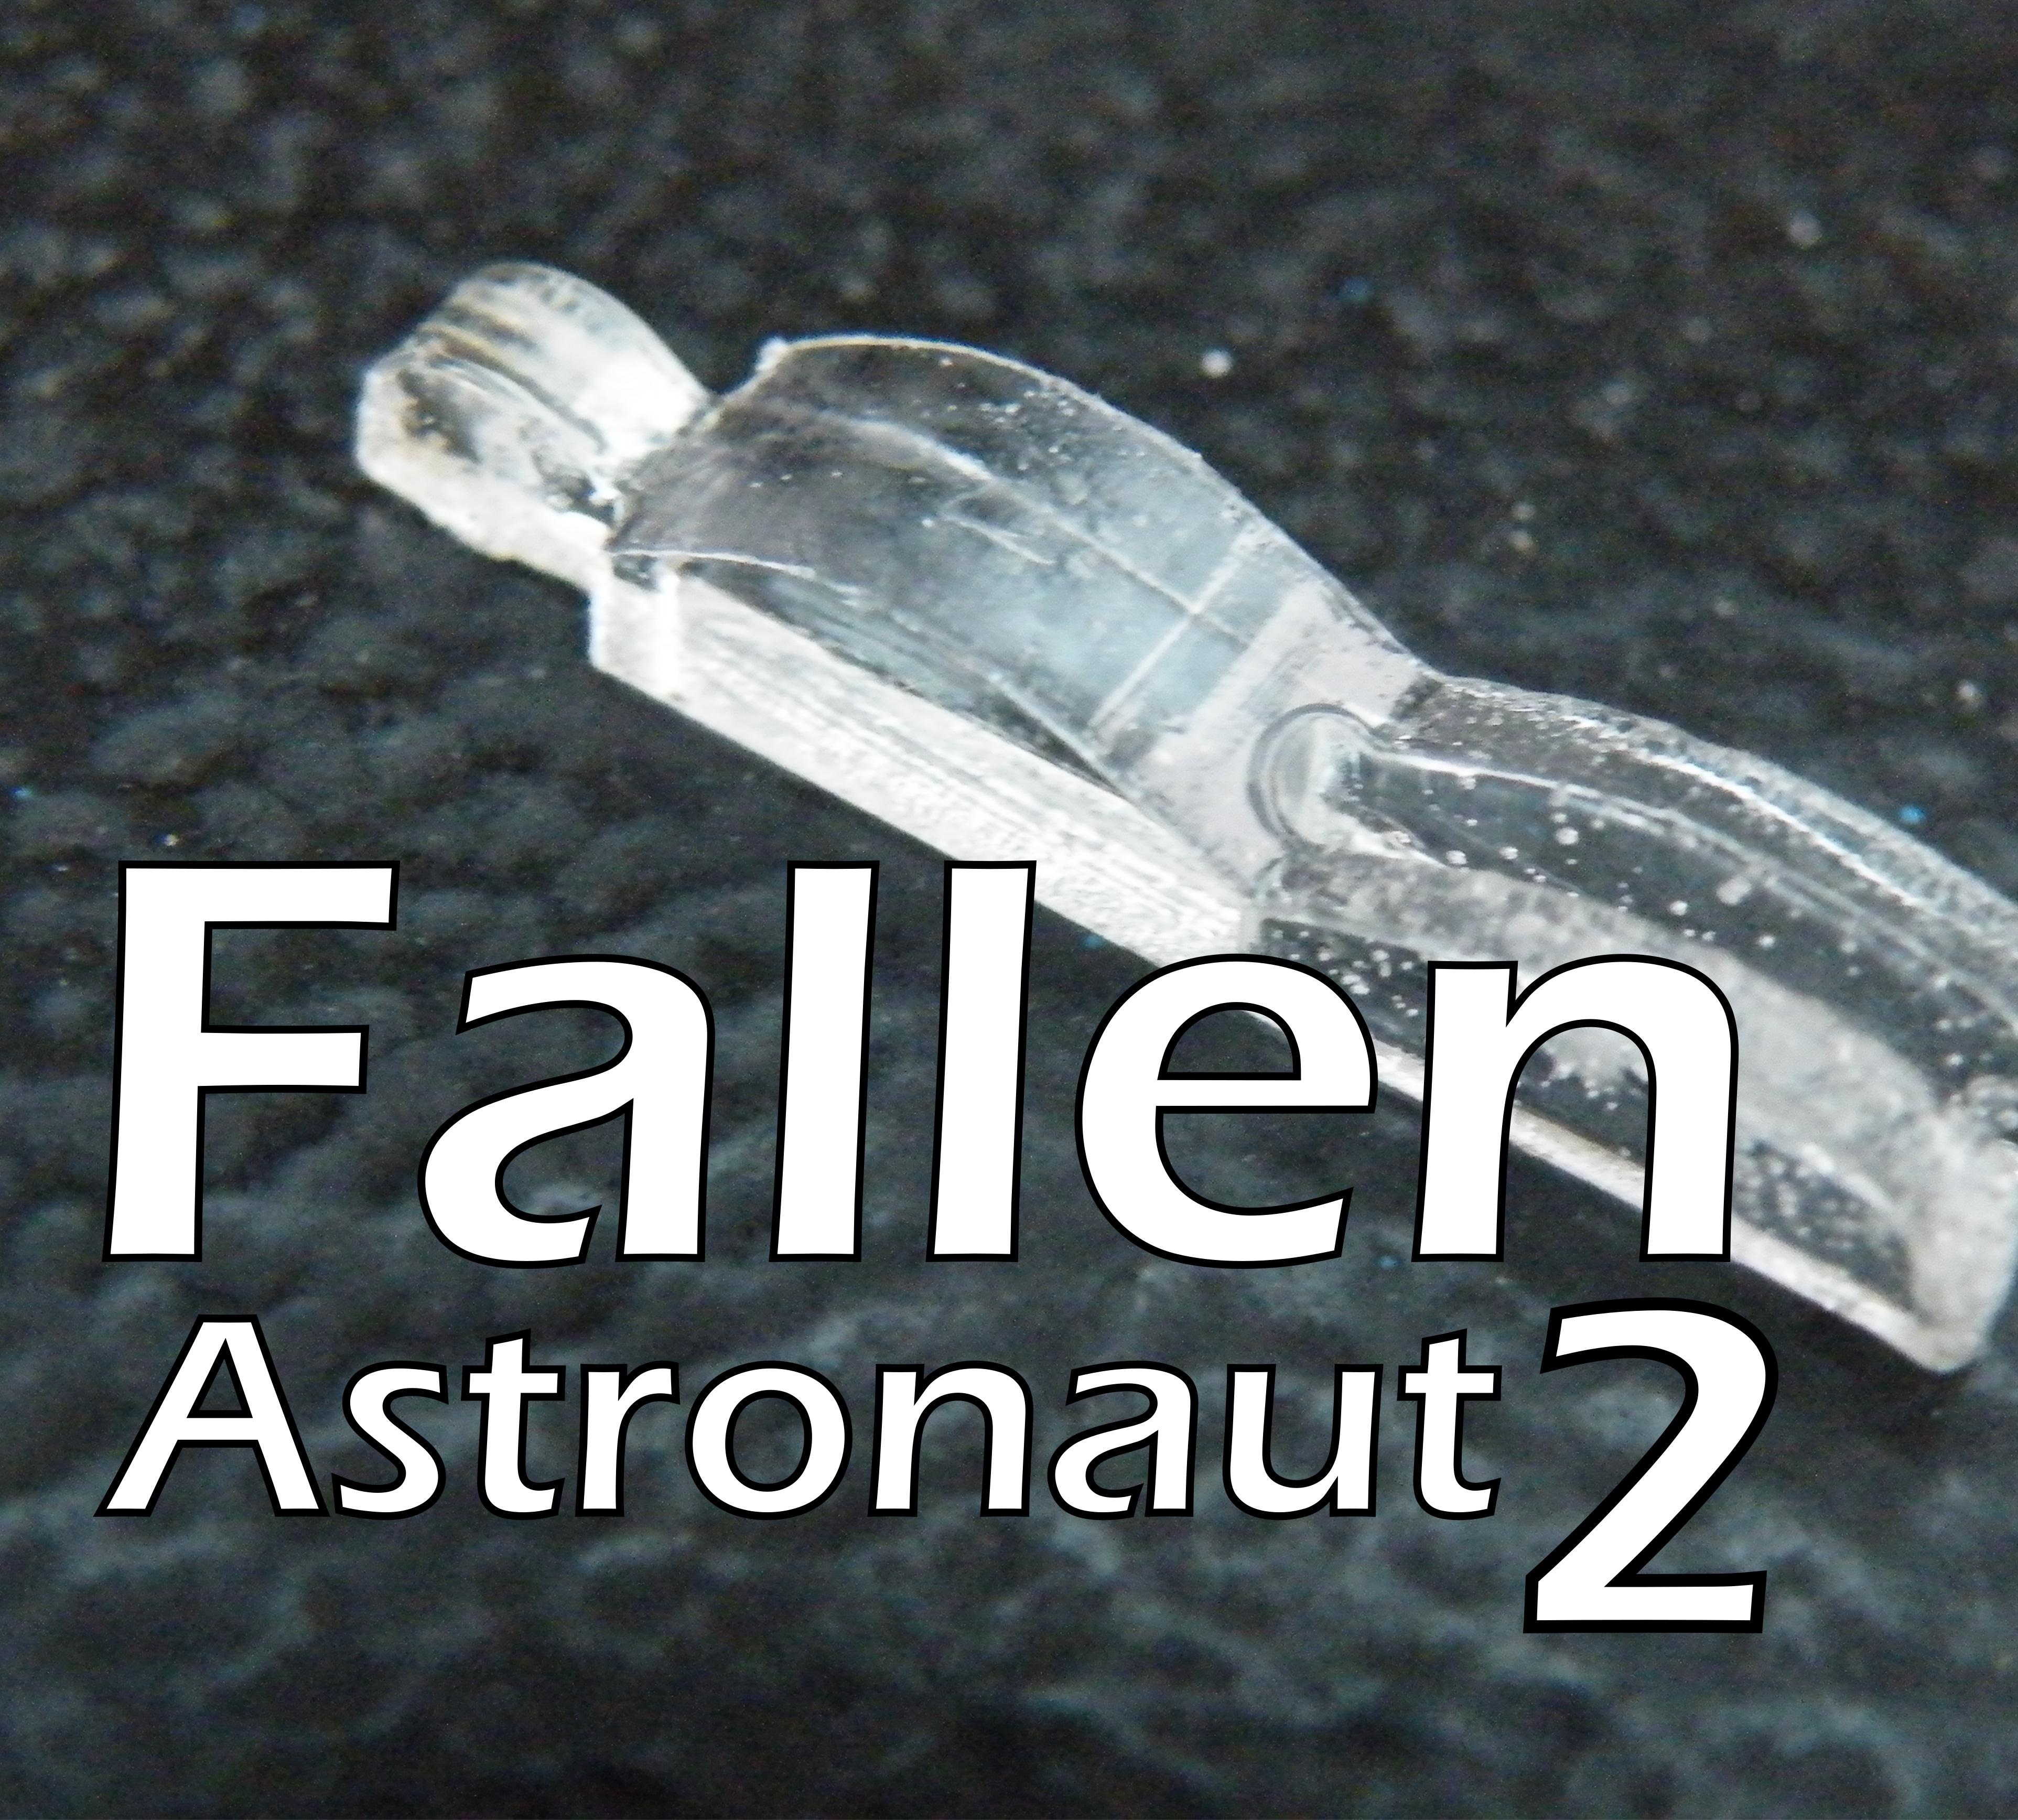 Picture of Fallen Astronaut 2